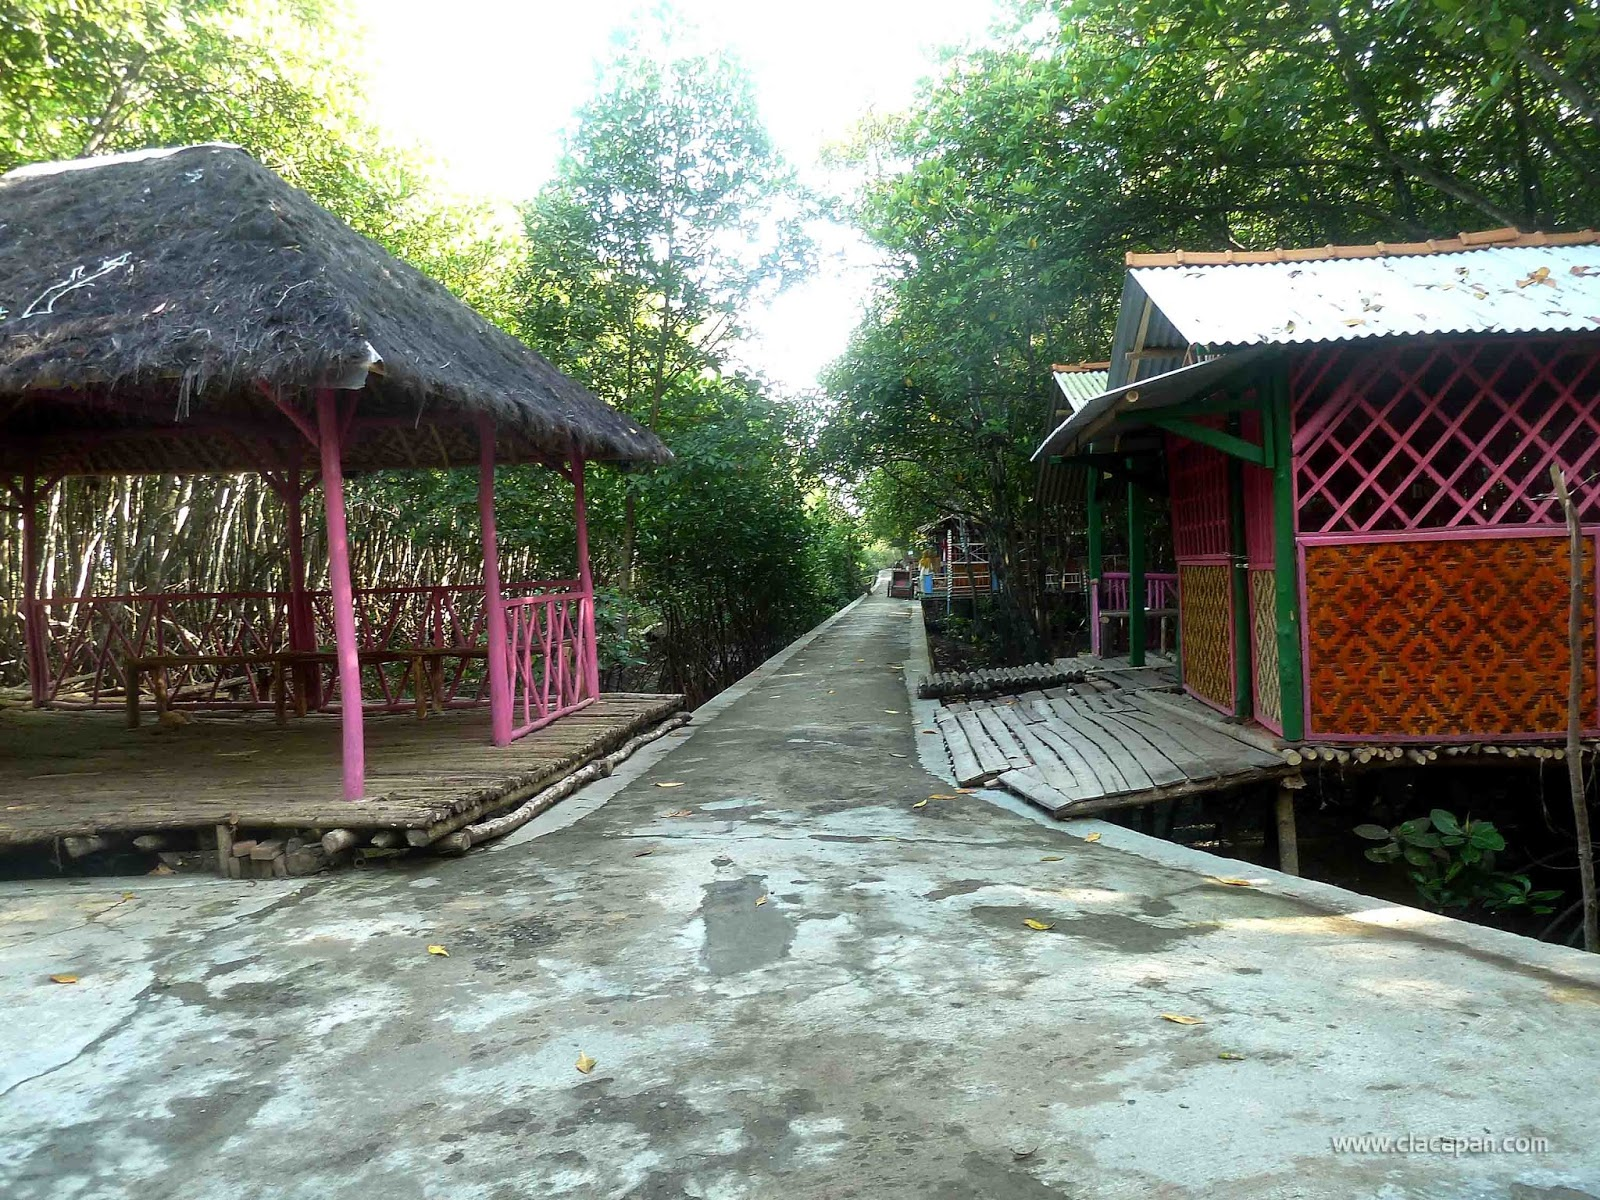 Wisata Hutan Payau Keindahannya Hampir Terlupakan Yuk Jalan Utama Area